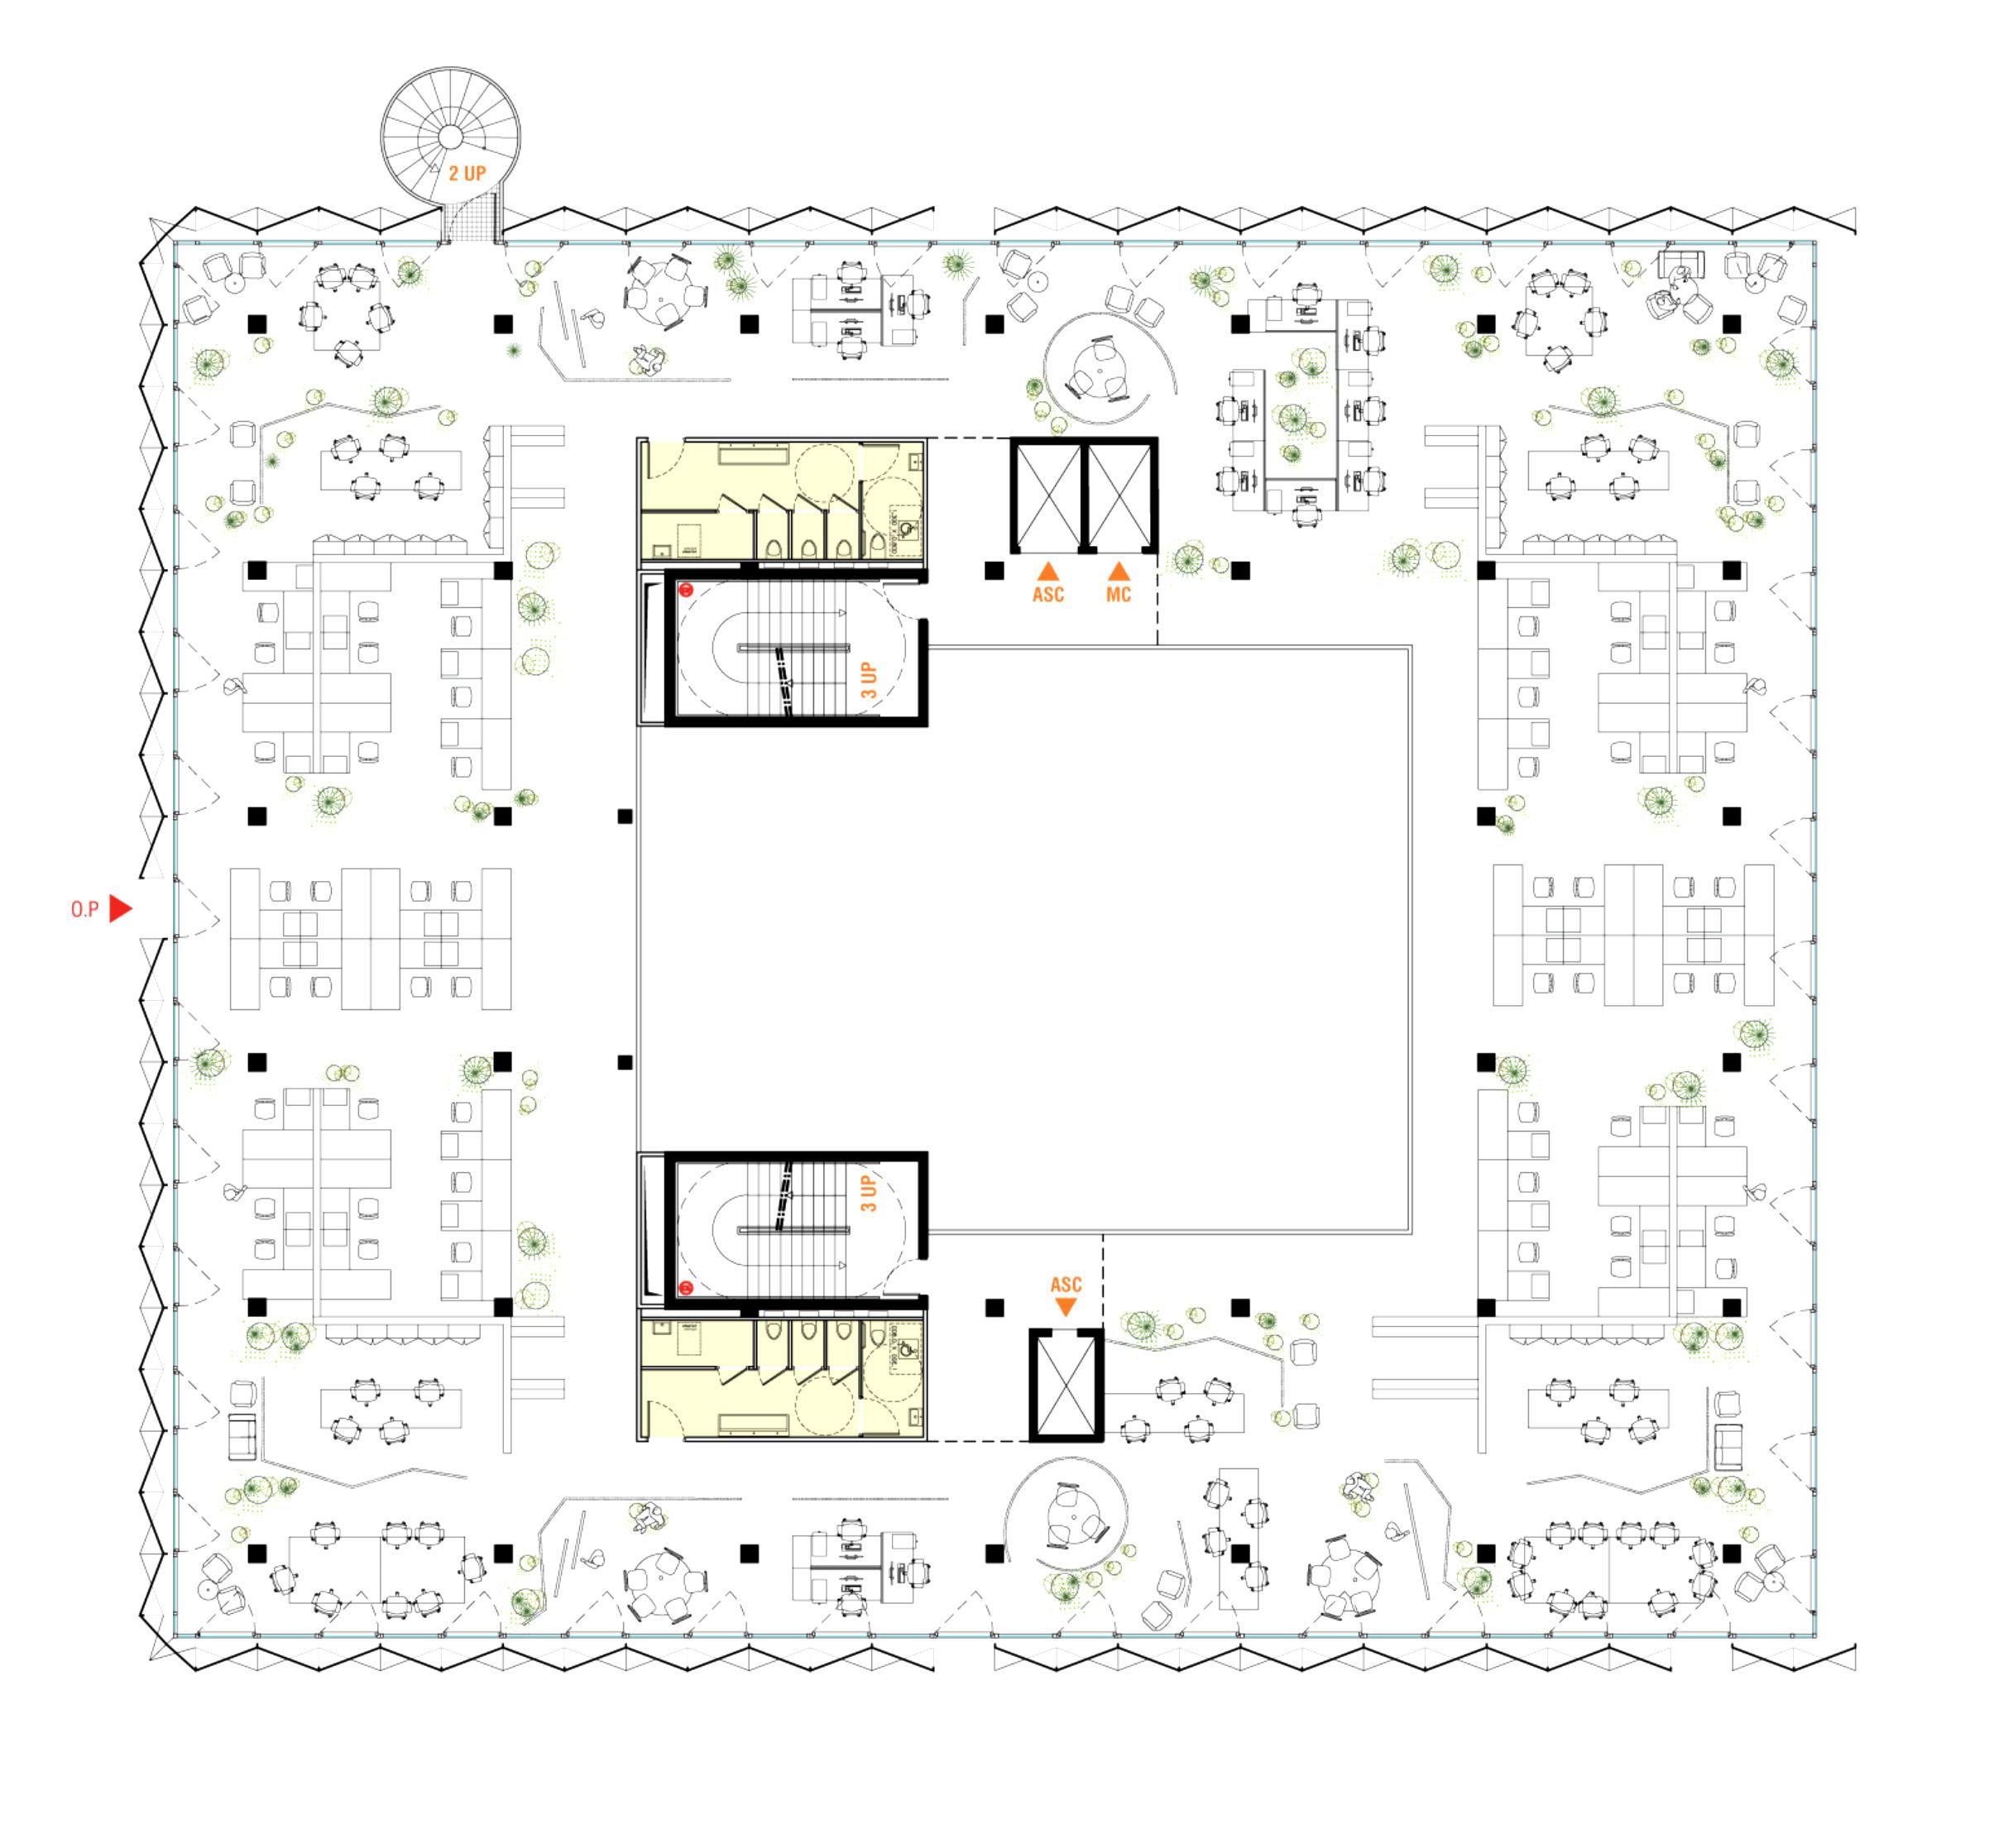 Querencia | Atelier d'architecture | Urban - Montreuil | Plan